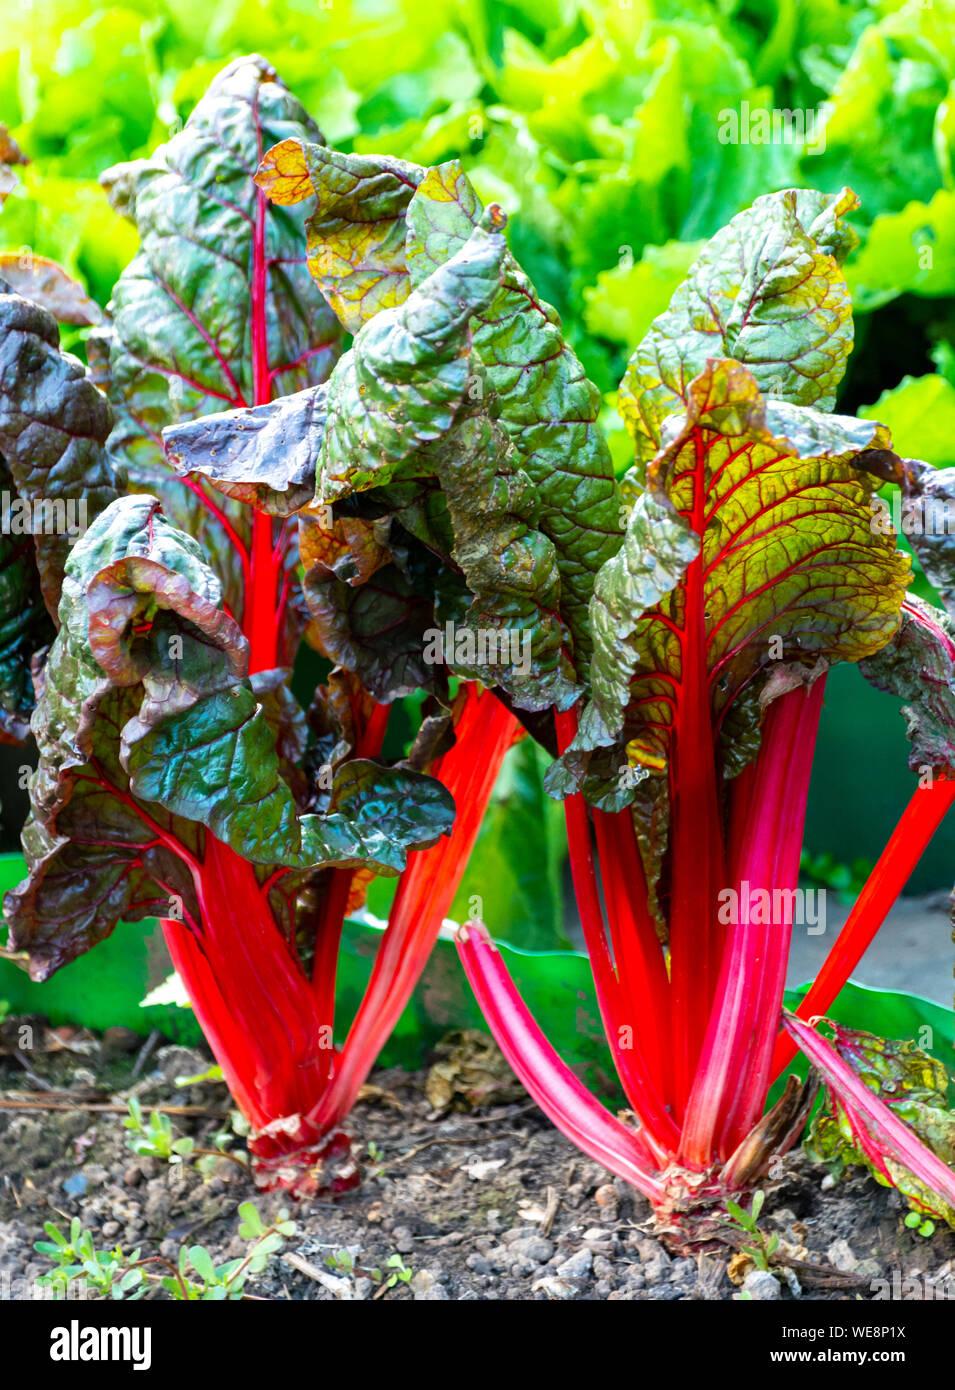 Sour leaf culinair vegetable red rhubarb growing in garden Stock Photo